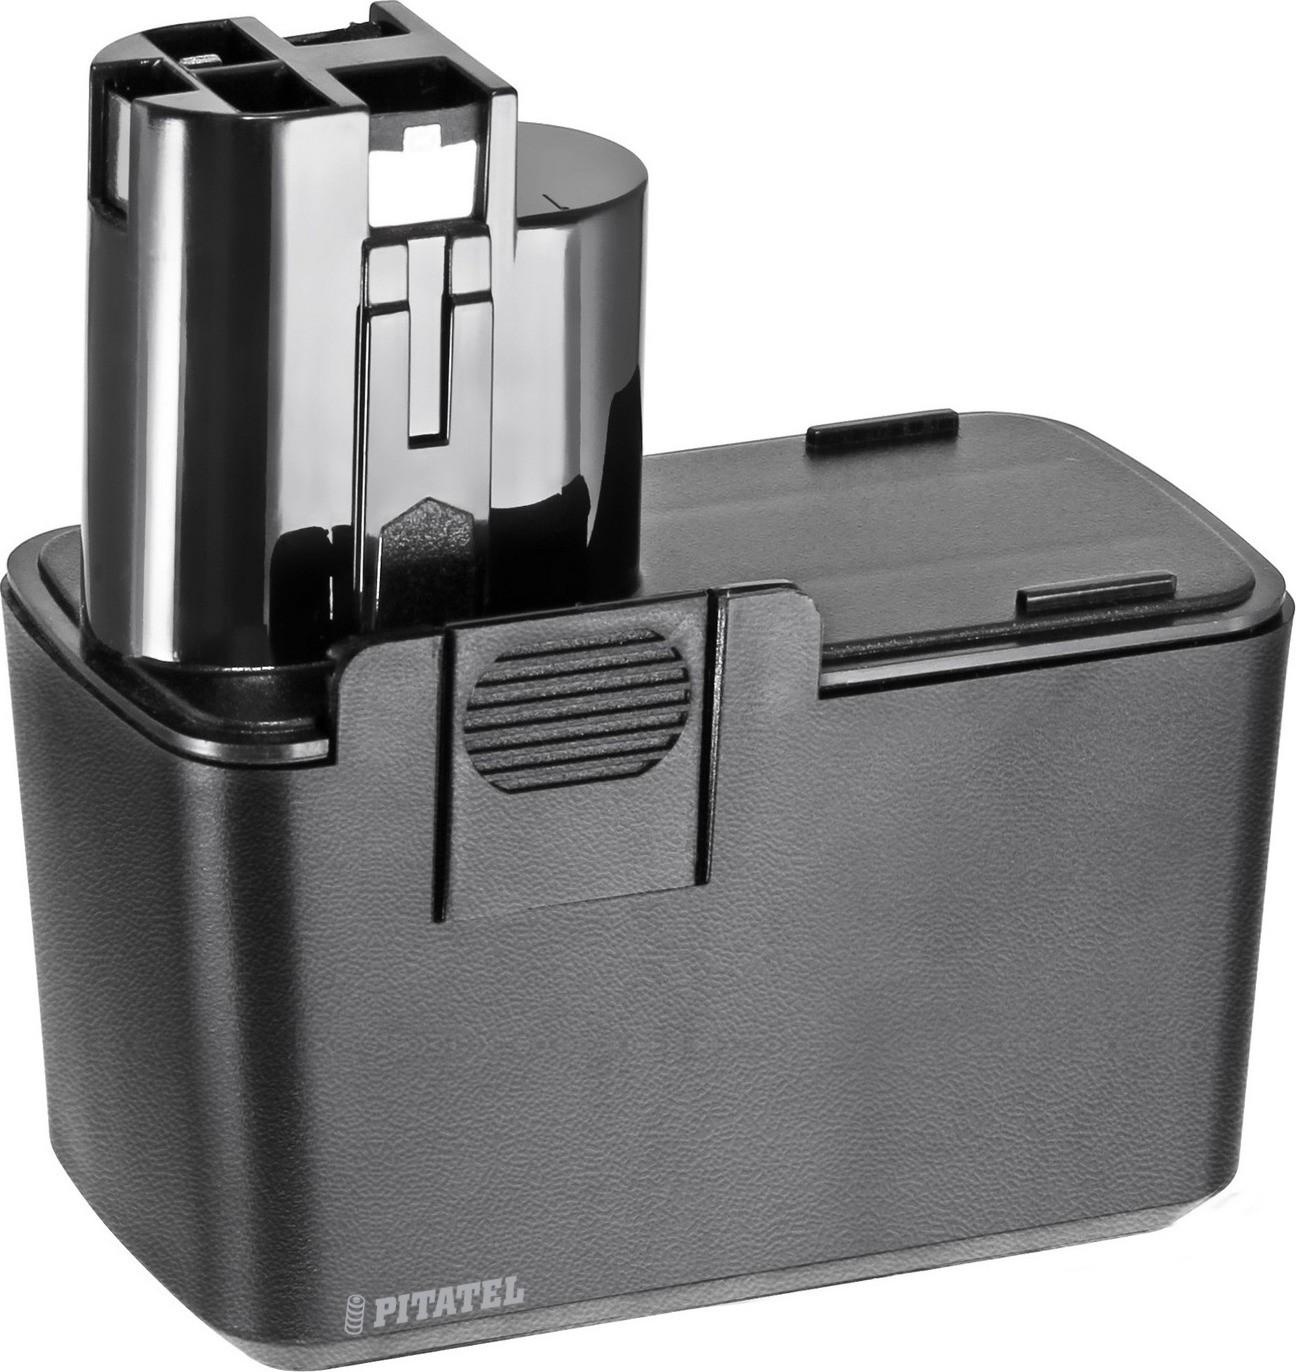 Аккумулятор для инструмента Pitatel для BOSCH. TSB-139-BOS72B-15C батарея аккумуляторная для инструмента pitatel для bosch 2607336780 4 0ah 10 8v